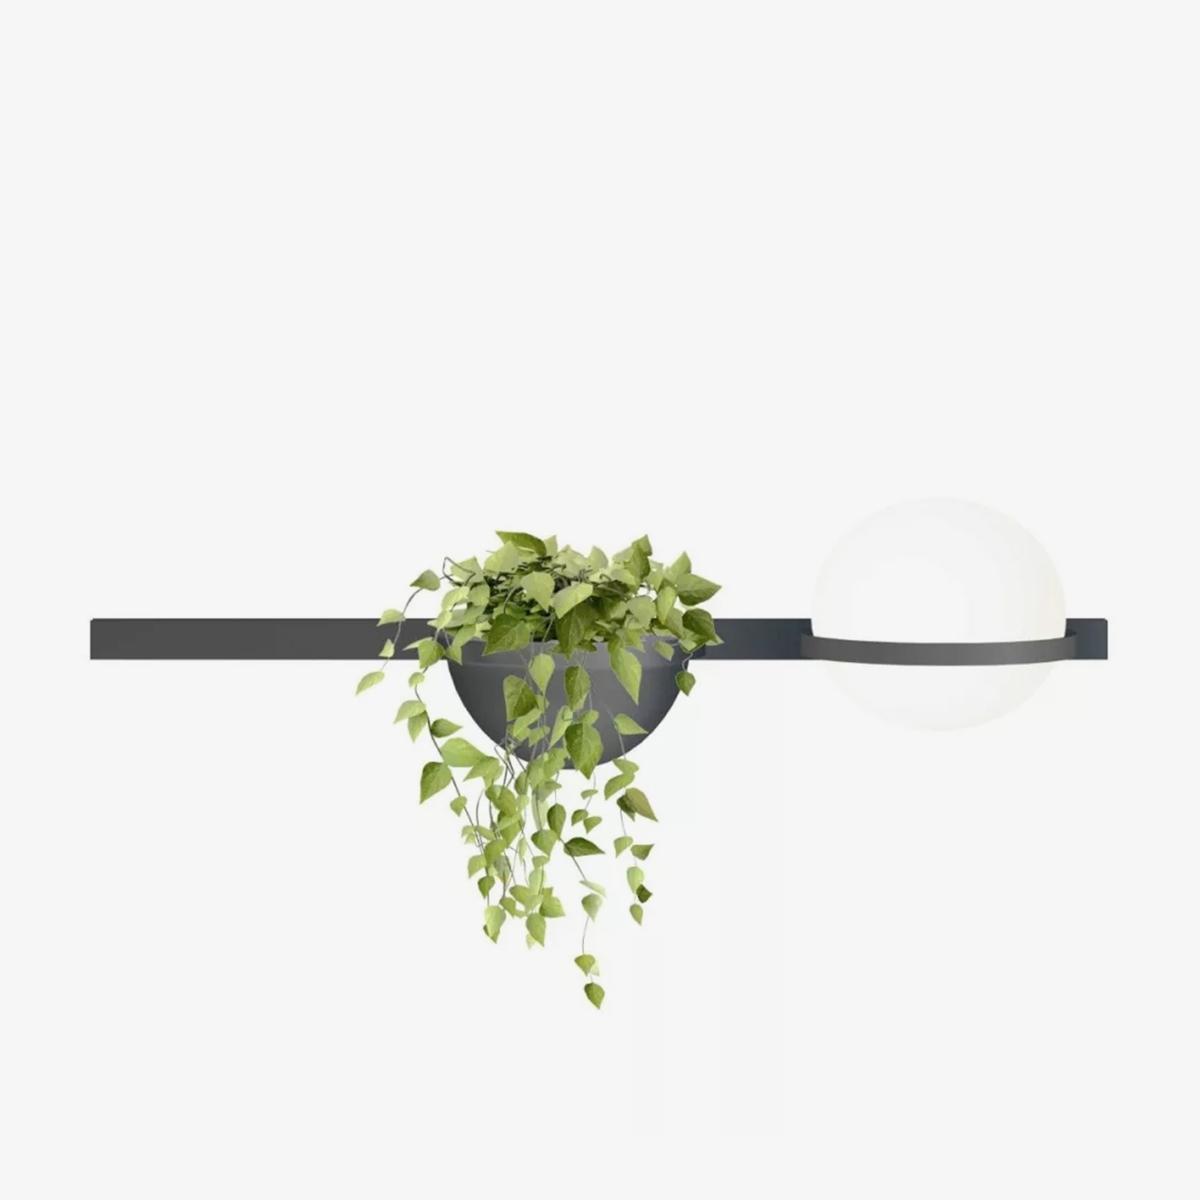 Aplique de pared Palma esfera planta grafito Vibia-0